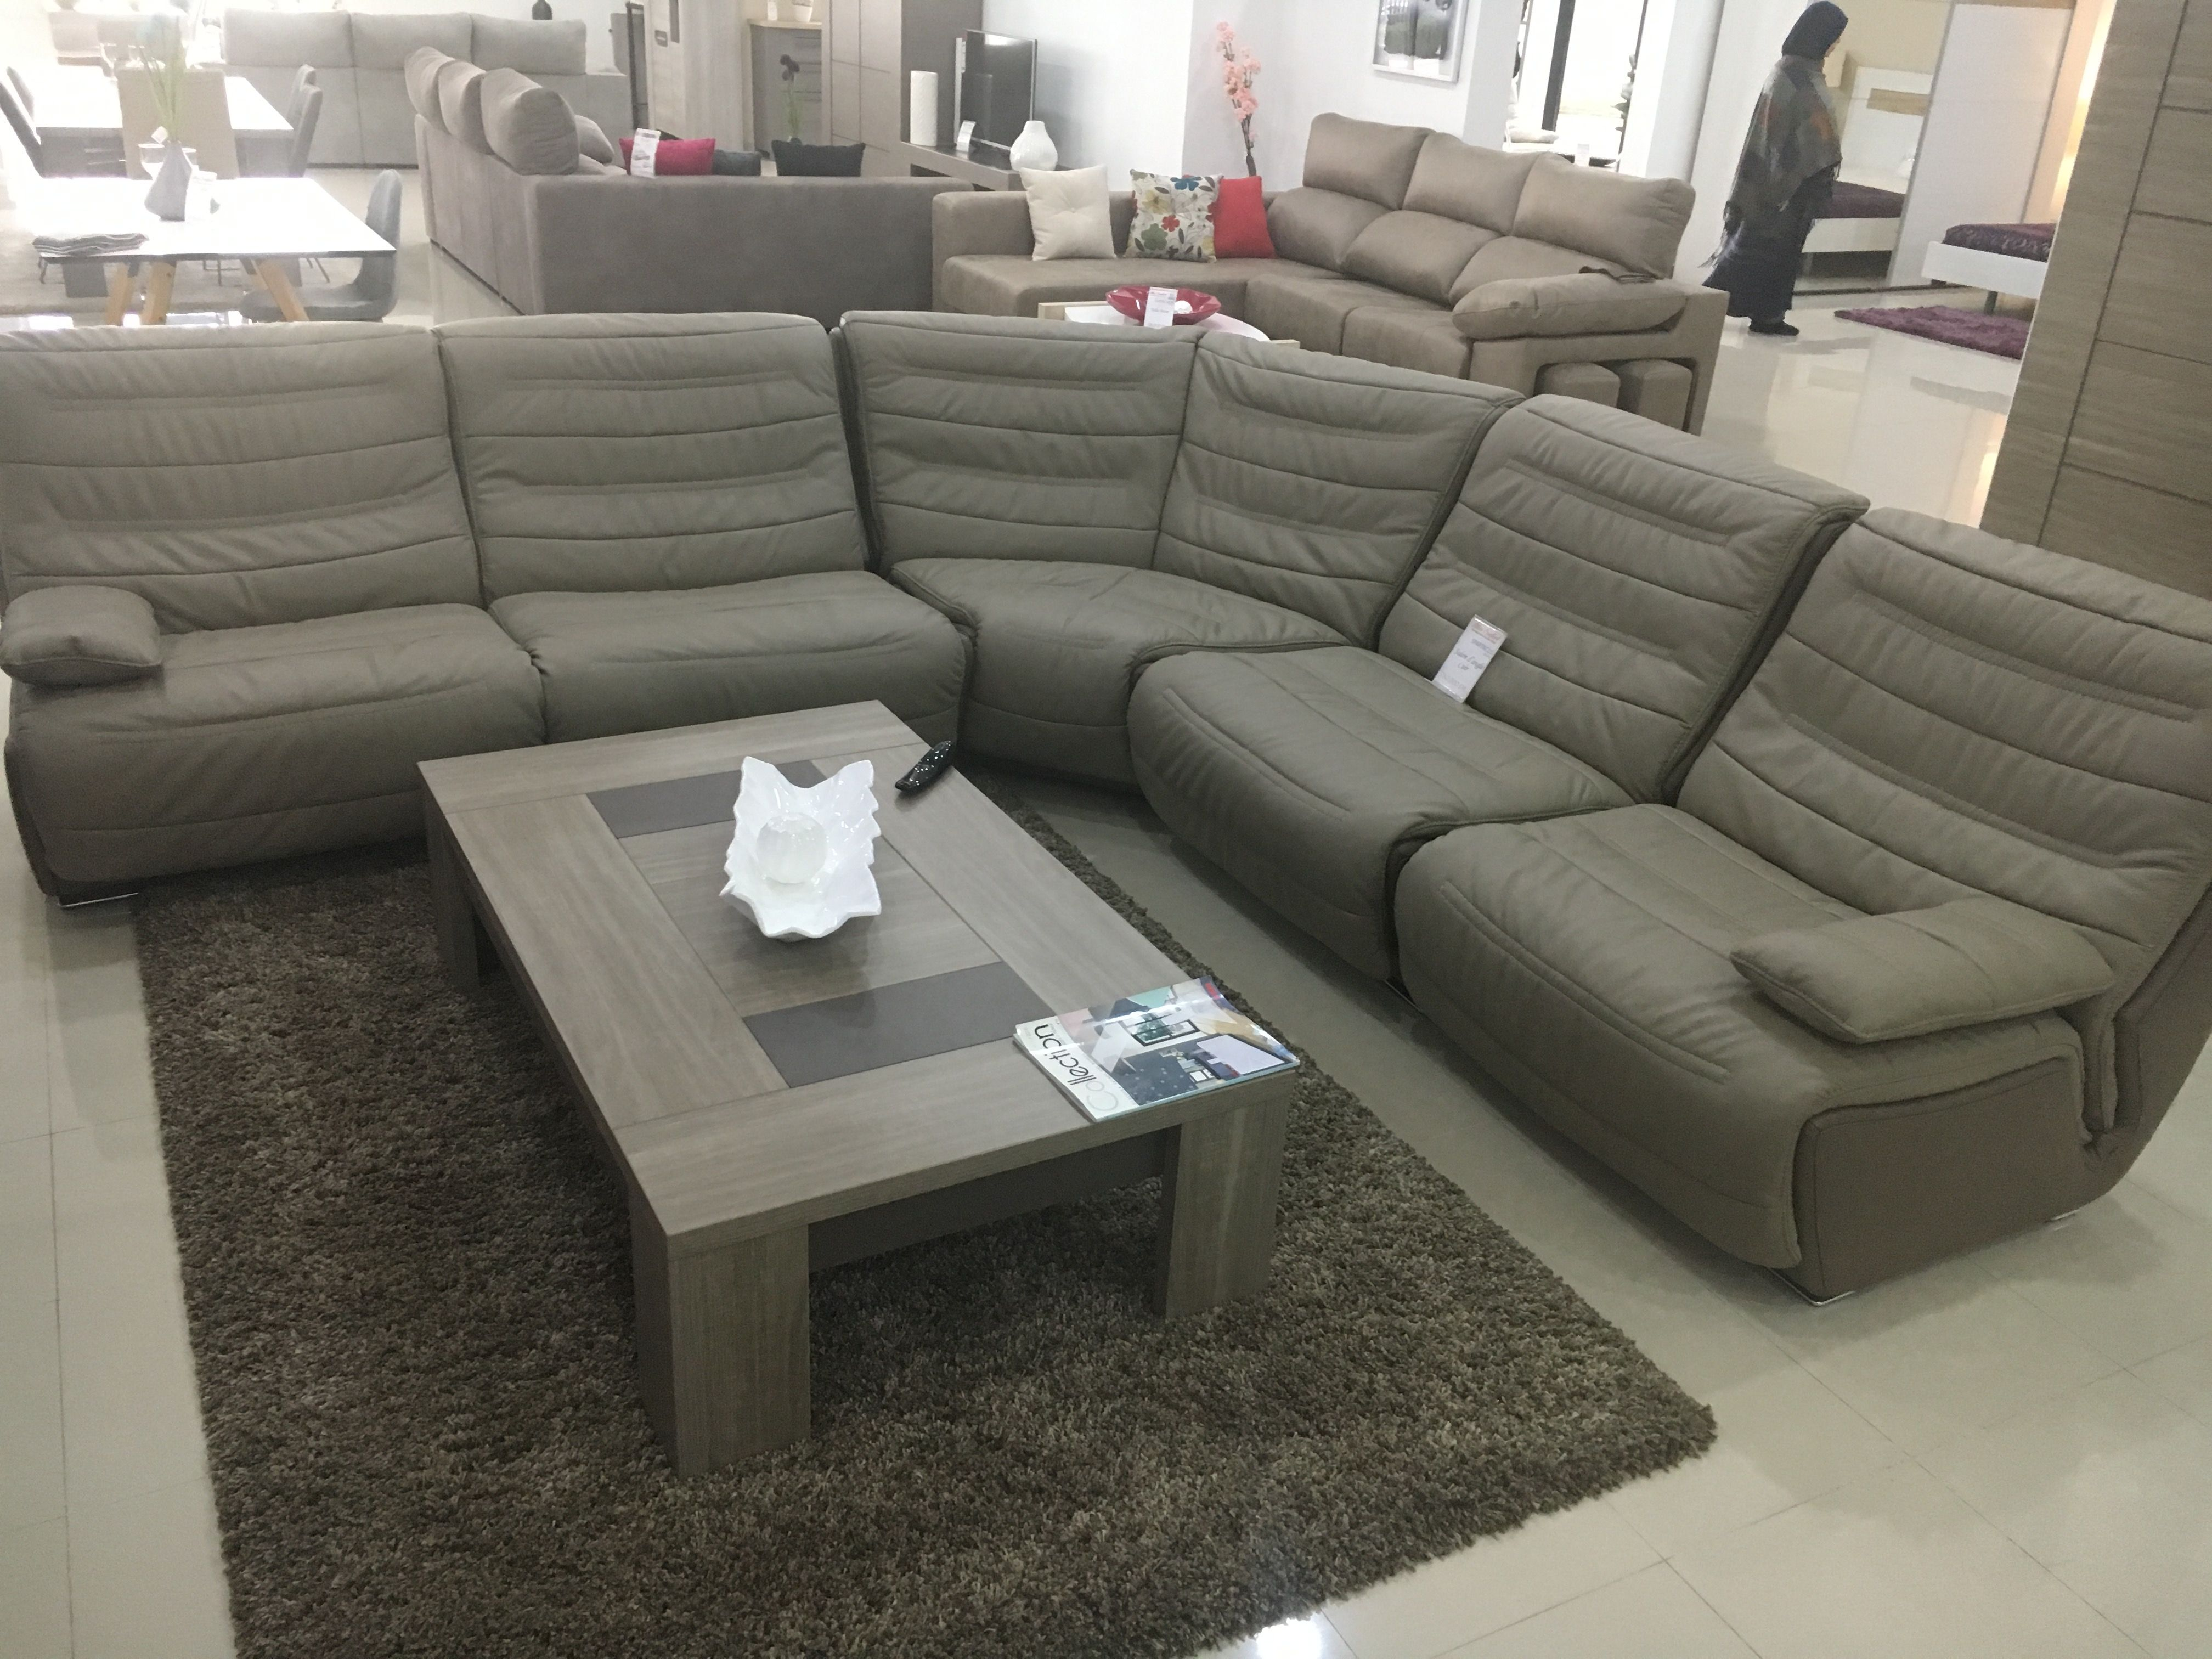 Salon En L Cuir Italien Sectional Couch Furniture Home Decor